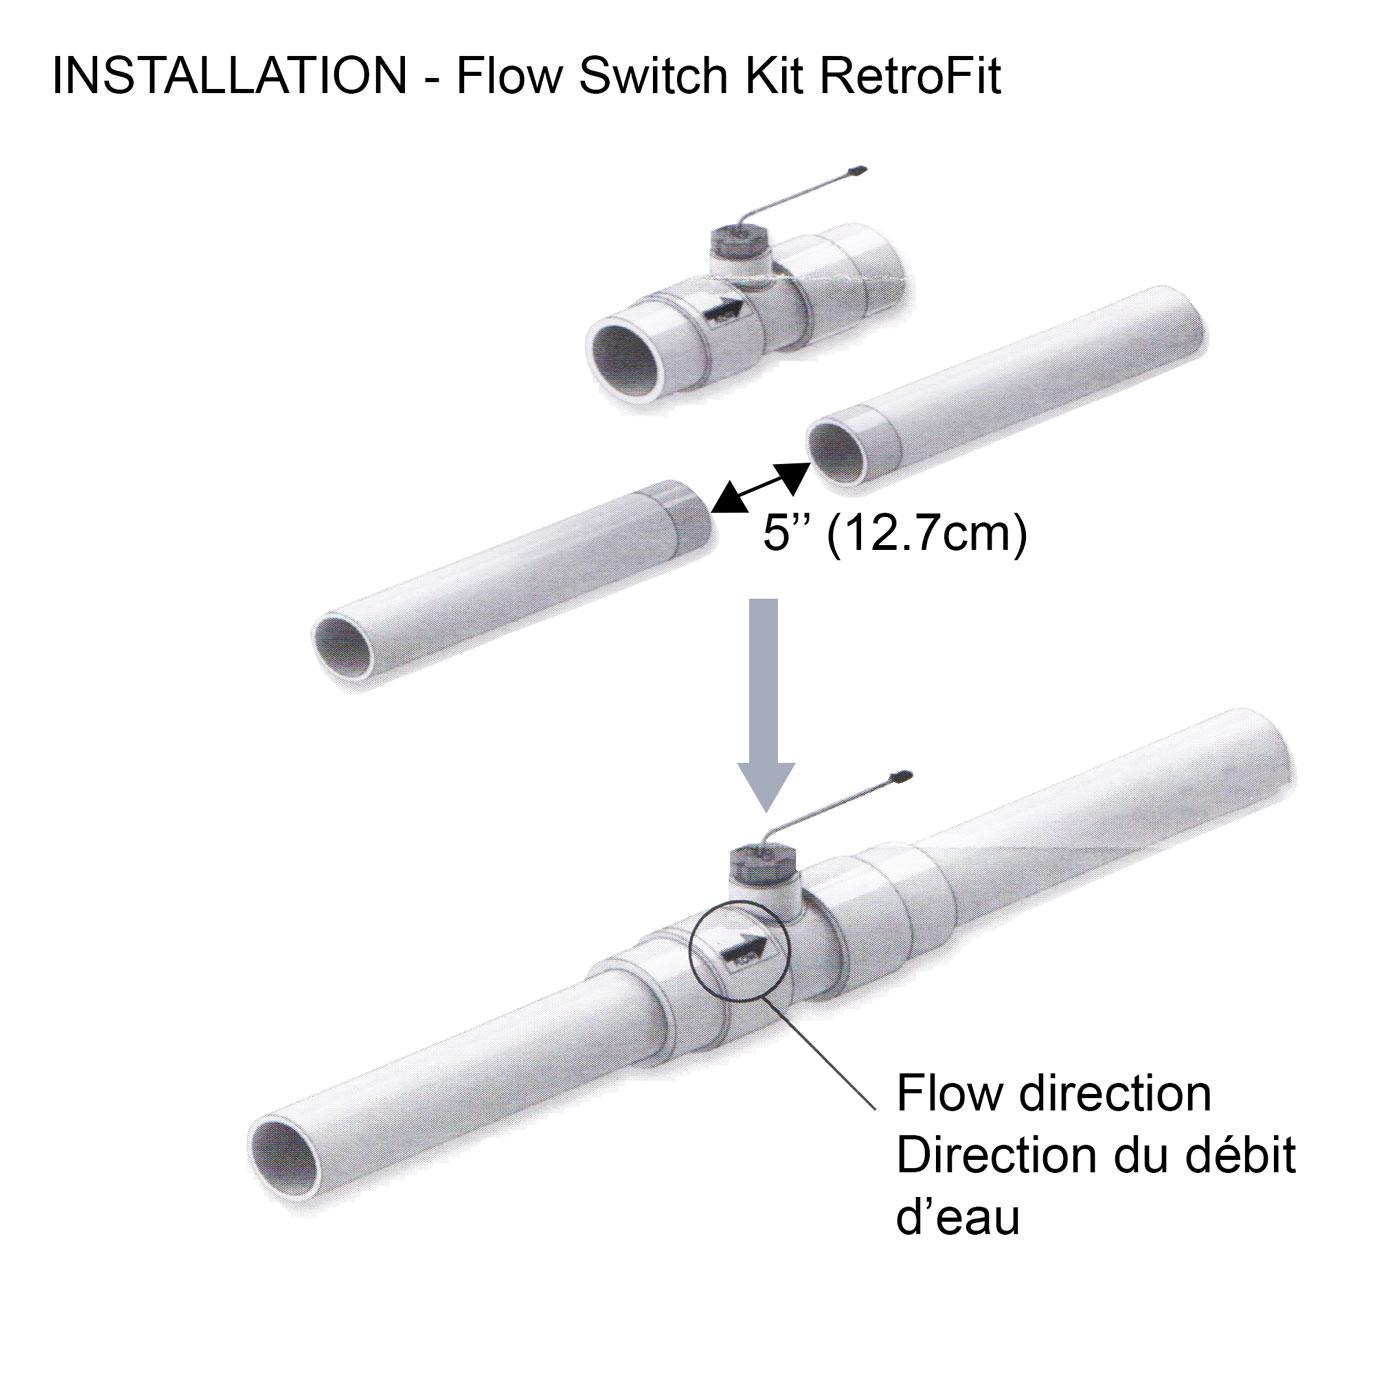 RetroFit flow sensor installation diagram